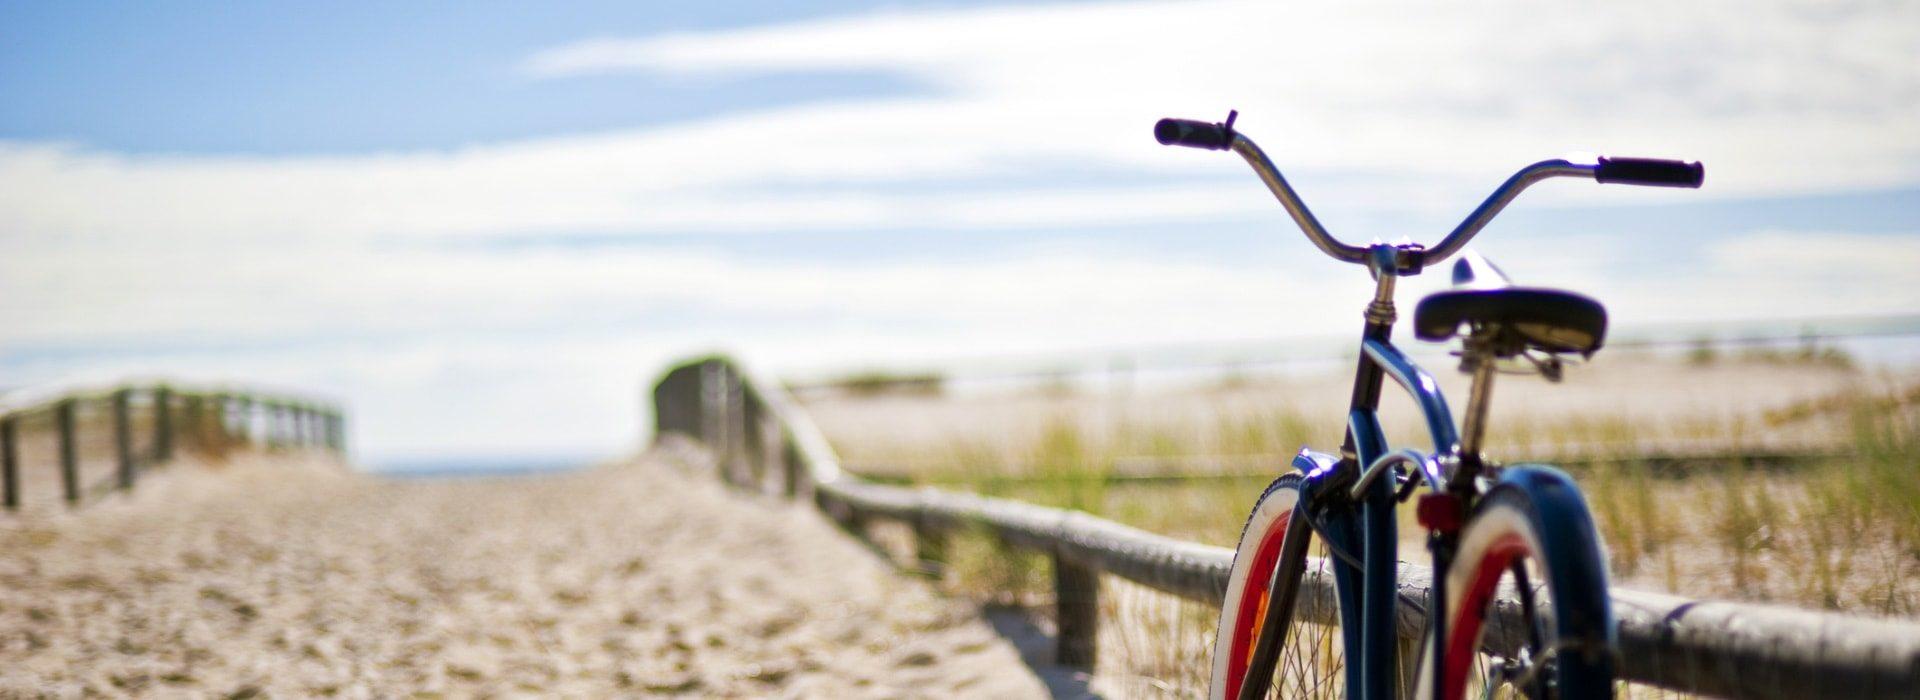 Bike near sandy path to beach